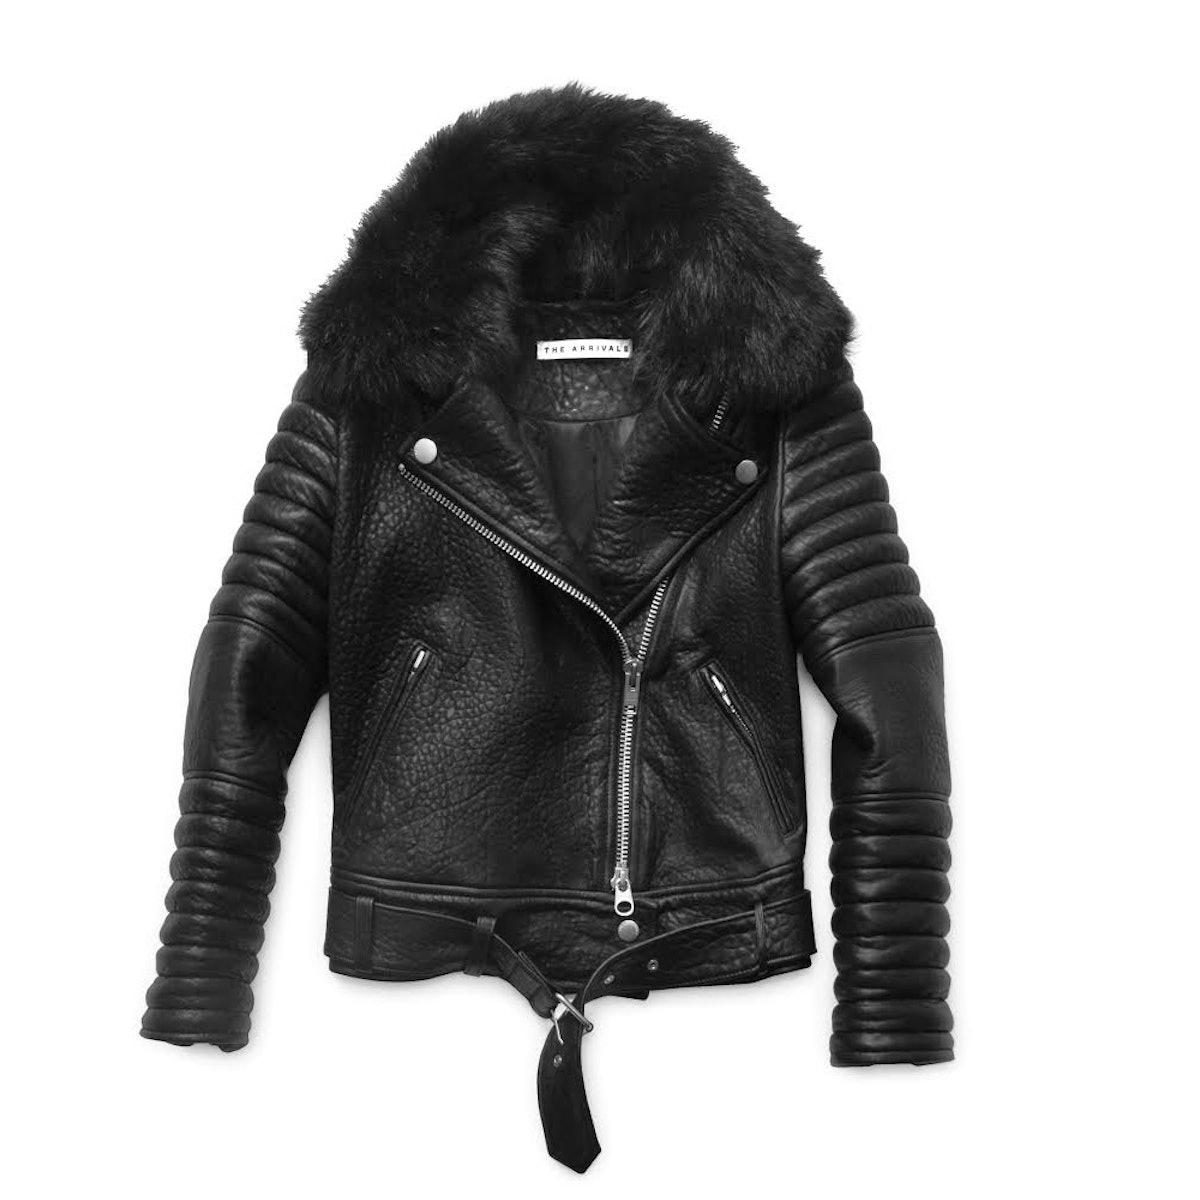 The Arrivals Rainier structured moto jacket